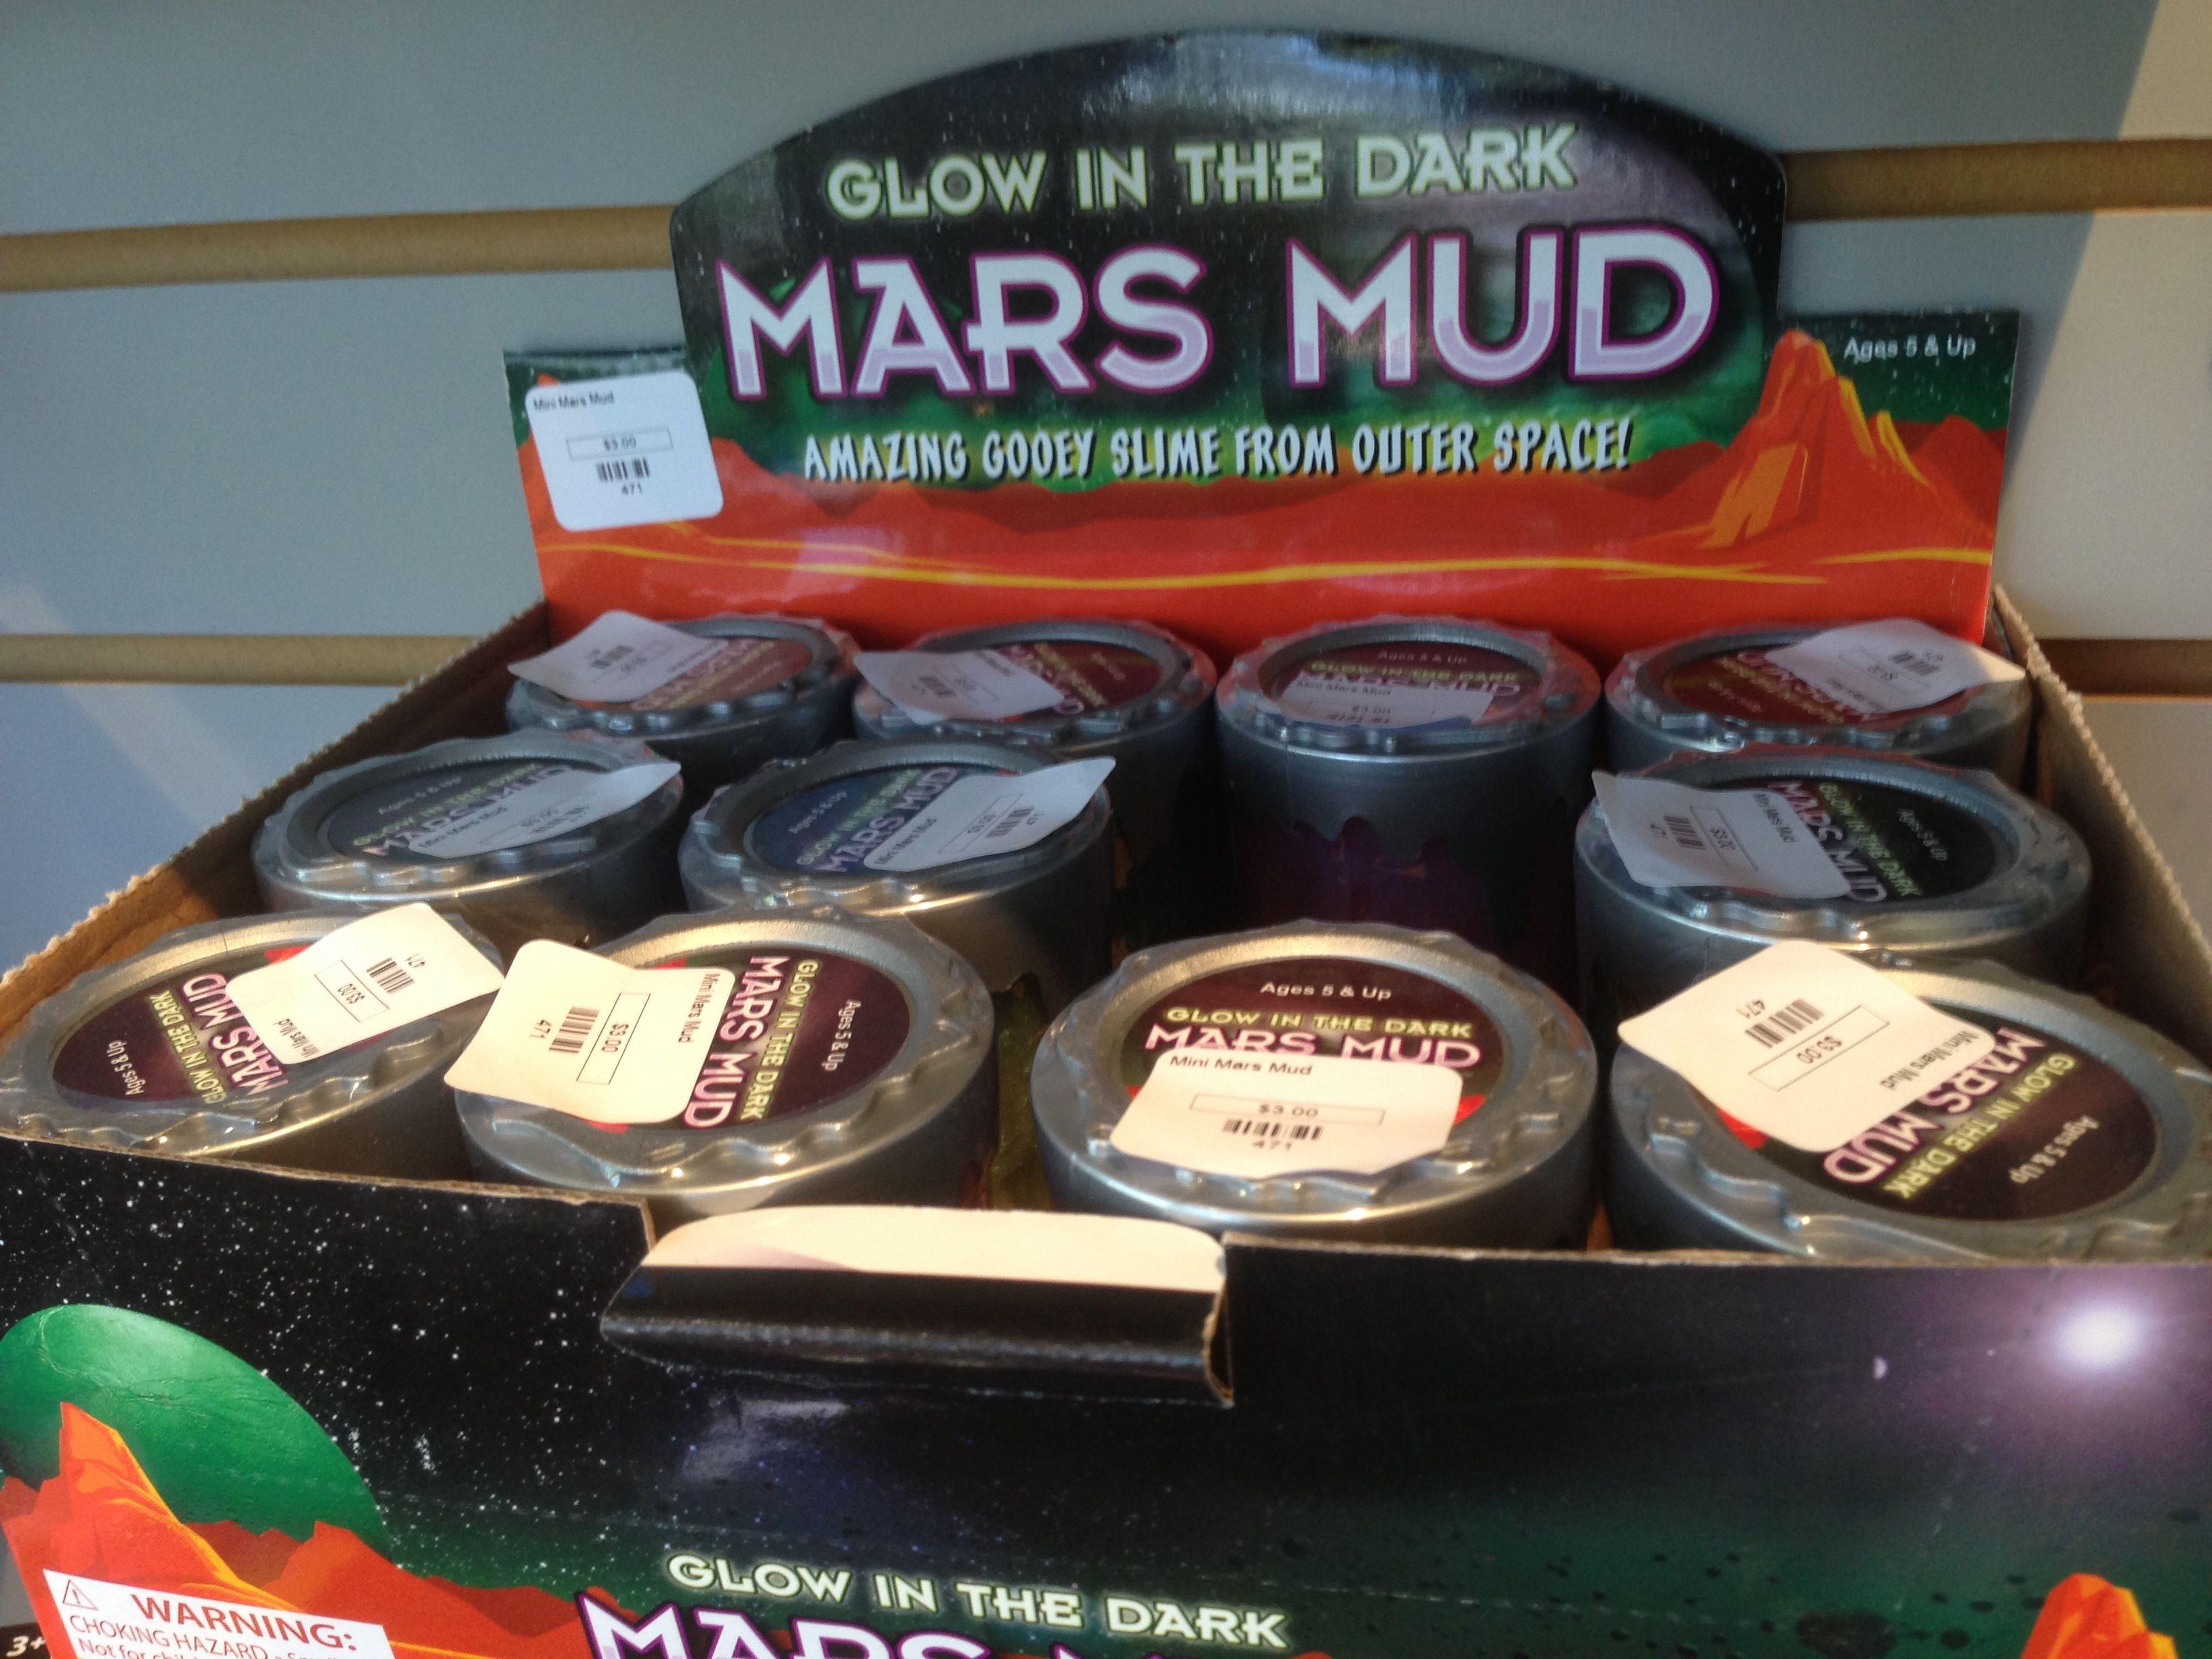 Mars Mud - at the NASA Ames Research Center gift shop ...